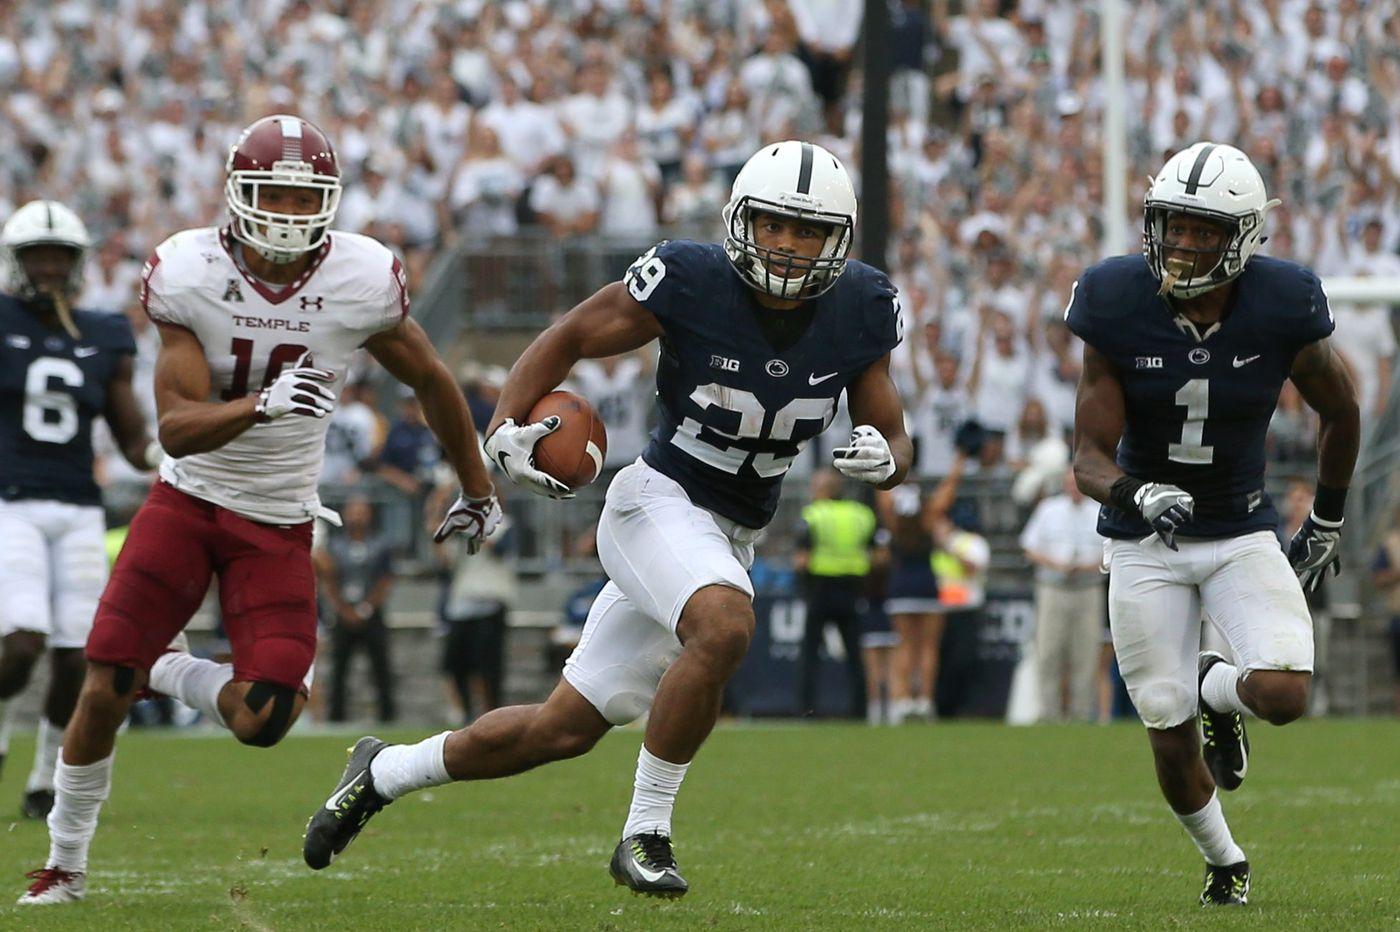 Penn State's John Reid, a St. Joseph's Prep grad, has no fear returning from knee injury